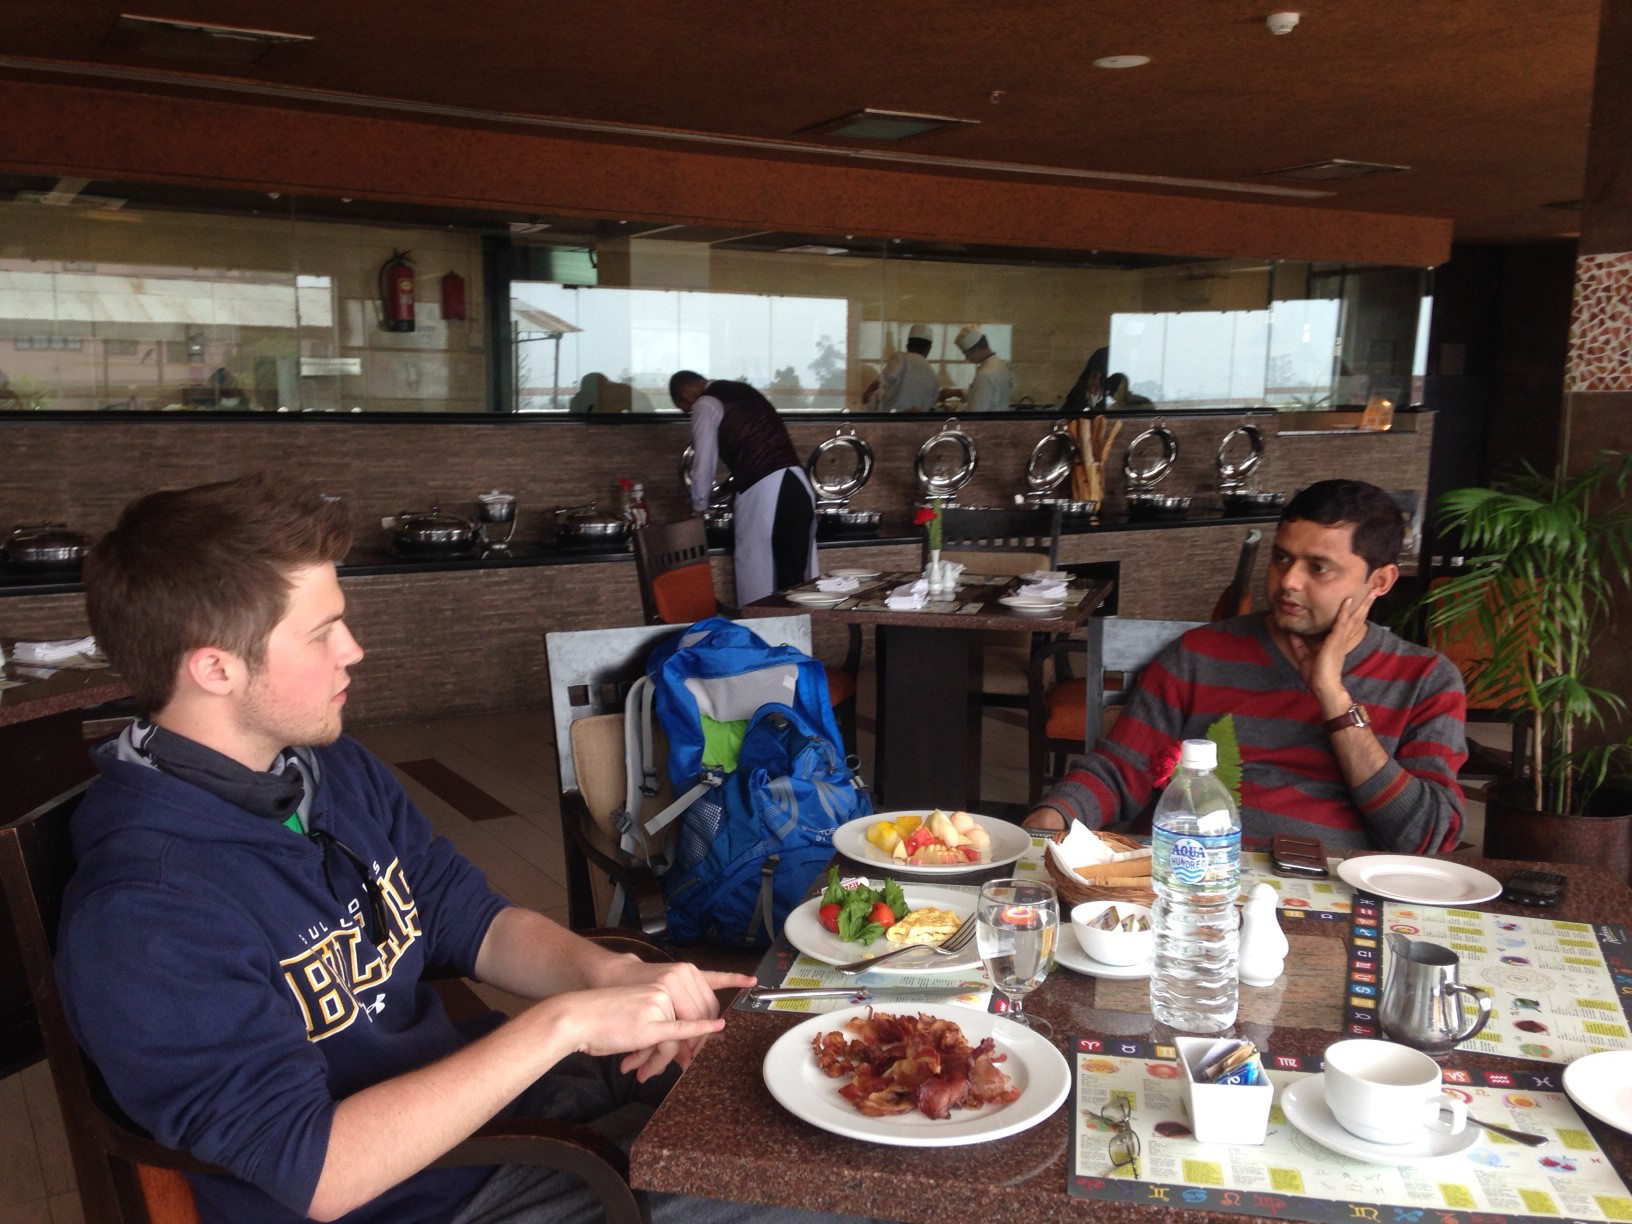 mck-3-27-15-himalayan-times-interview.jpg